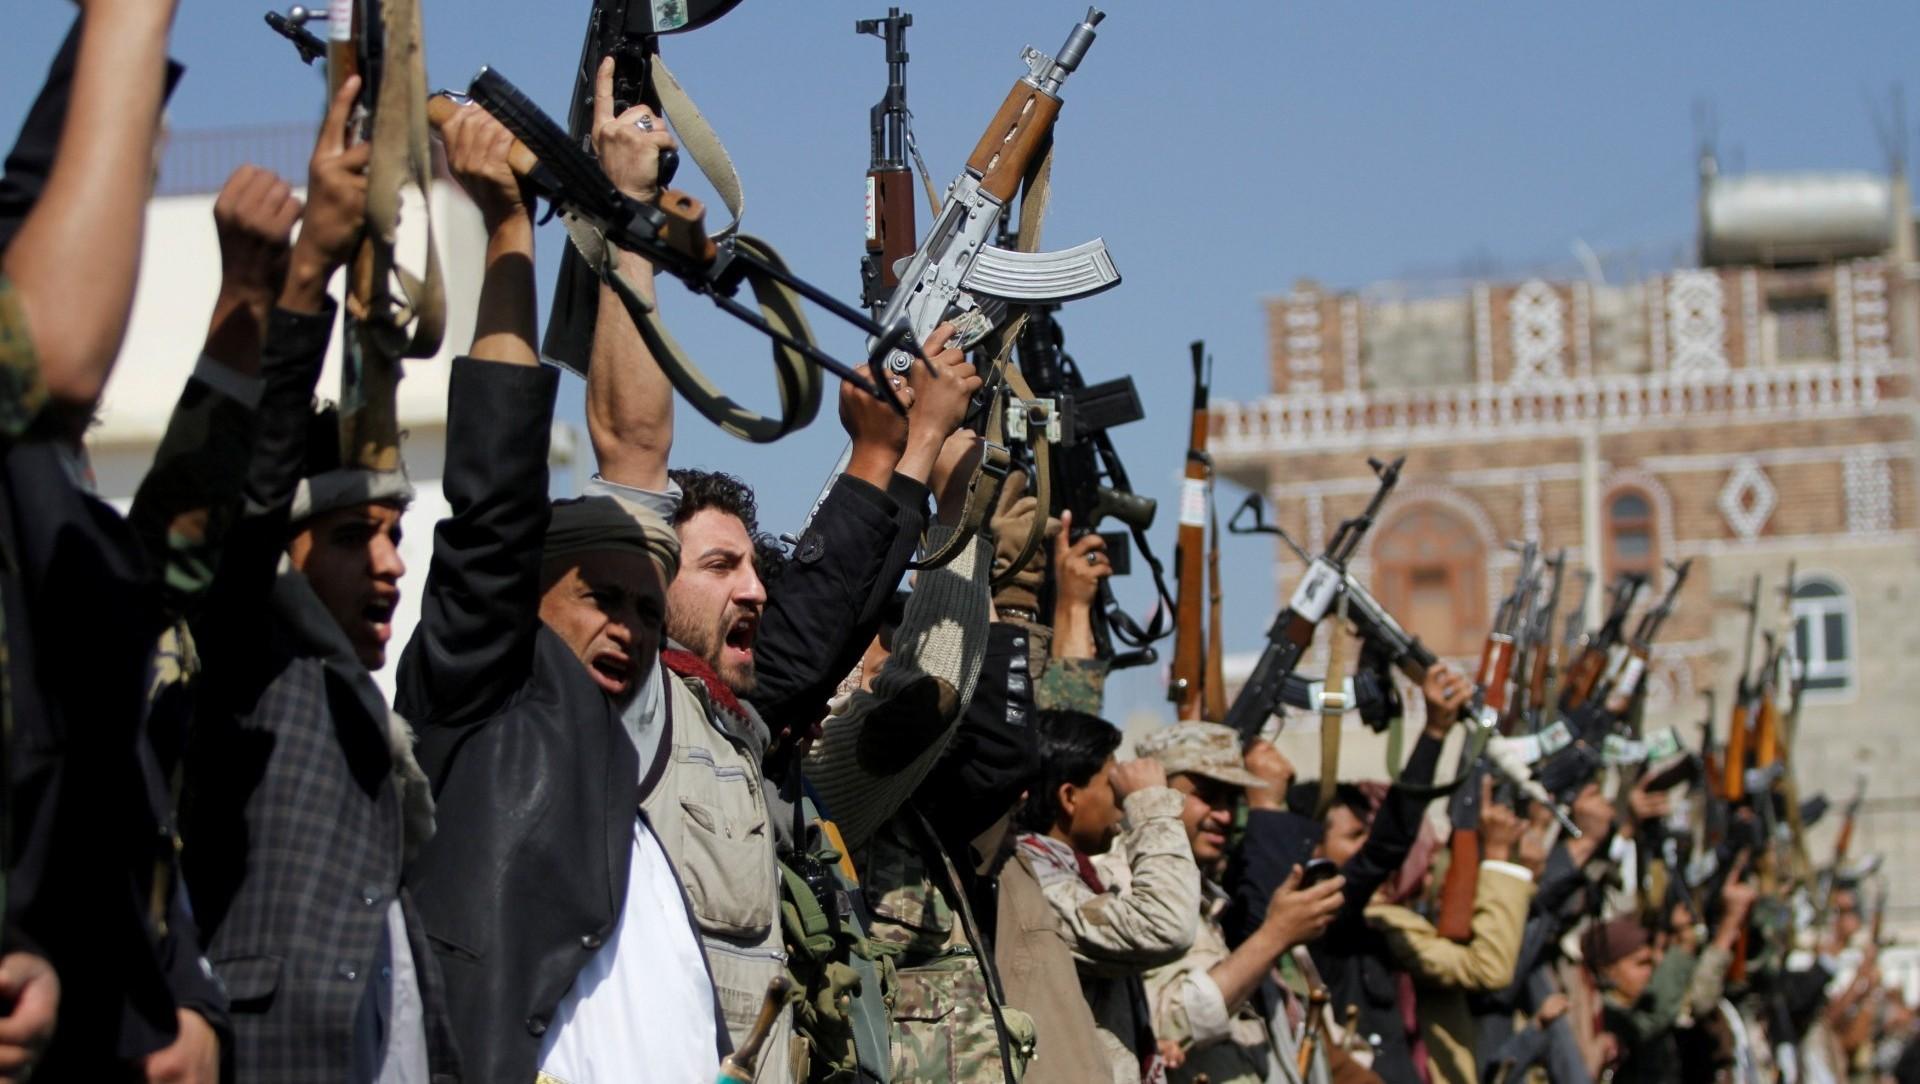 Milicias a fines a los hutíes en Yemen. (REUTERS/Mohamed al-Sayaghi)